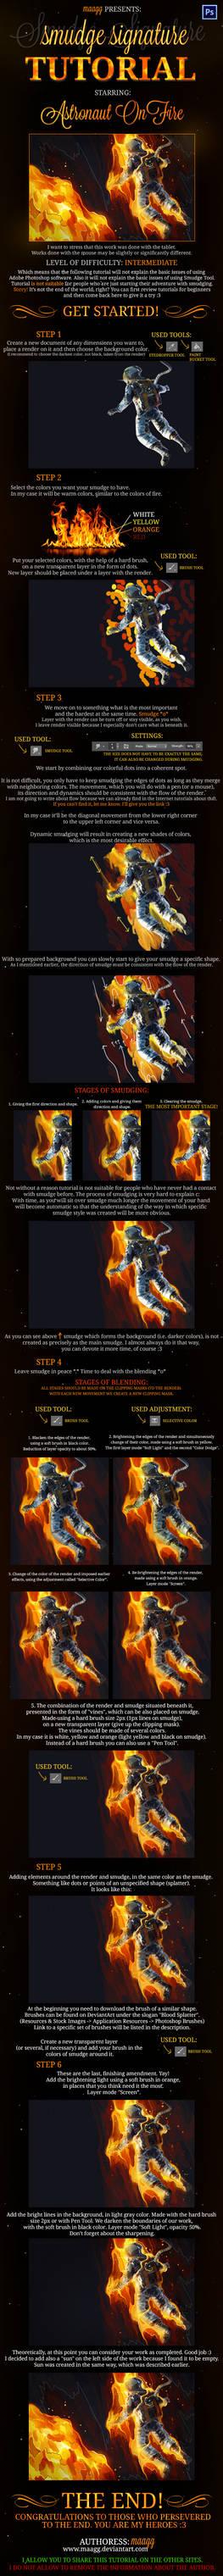 SMUDGE SIGNATURE TUTORIAL - Astronaut On Fire